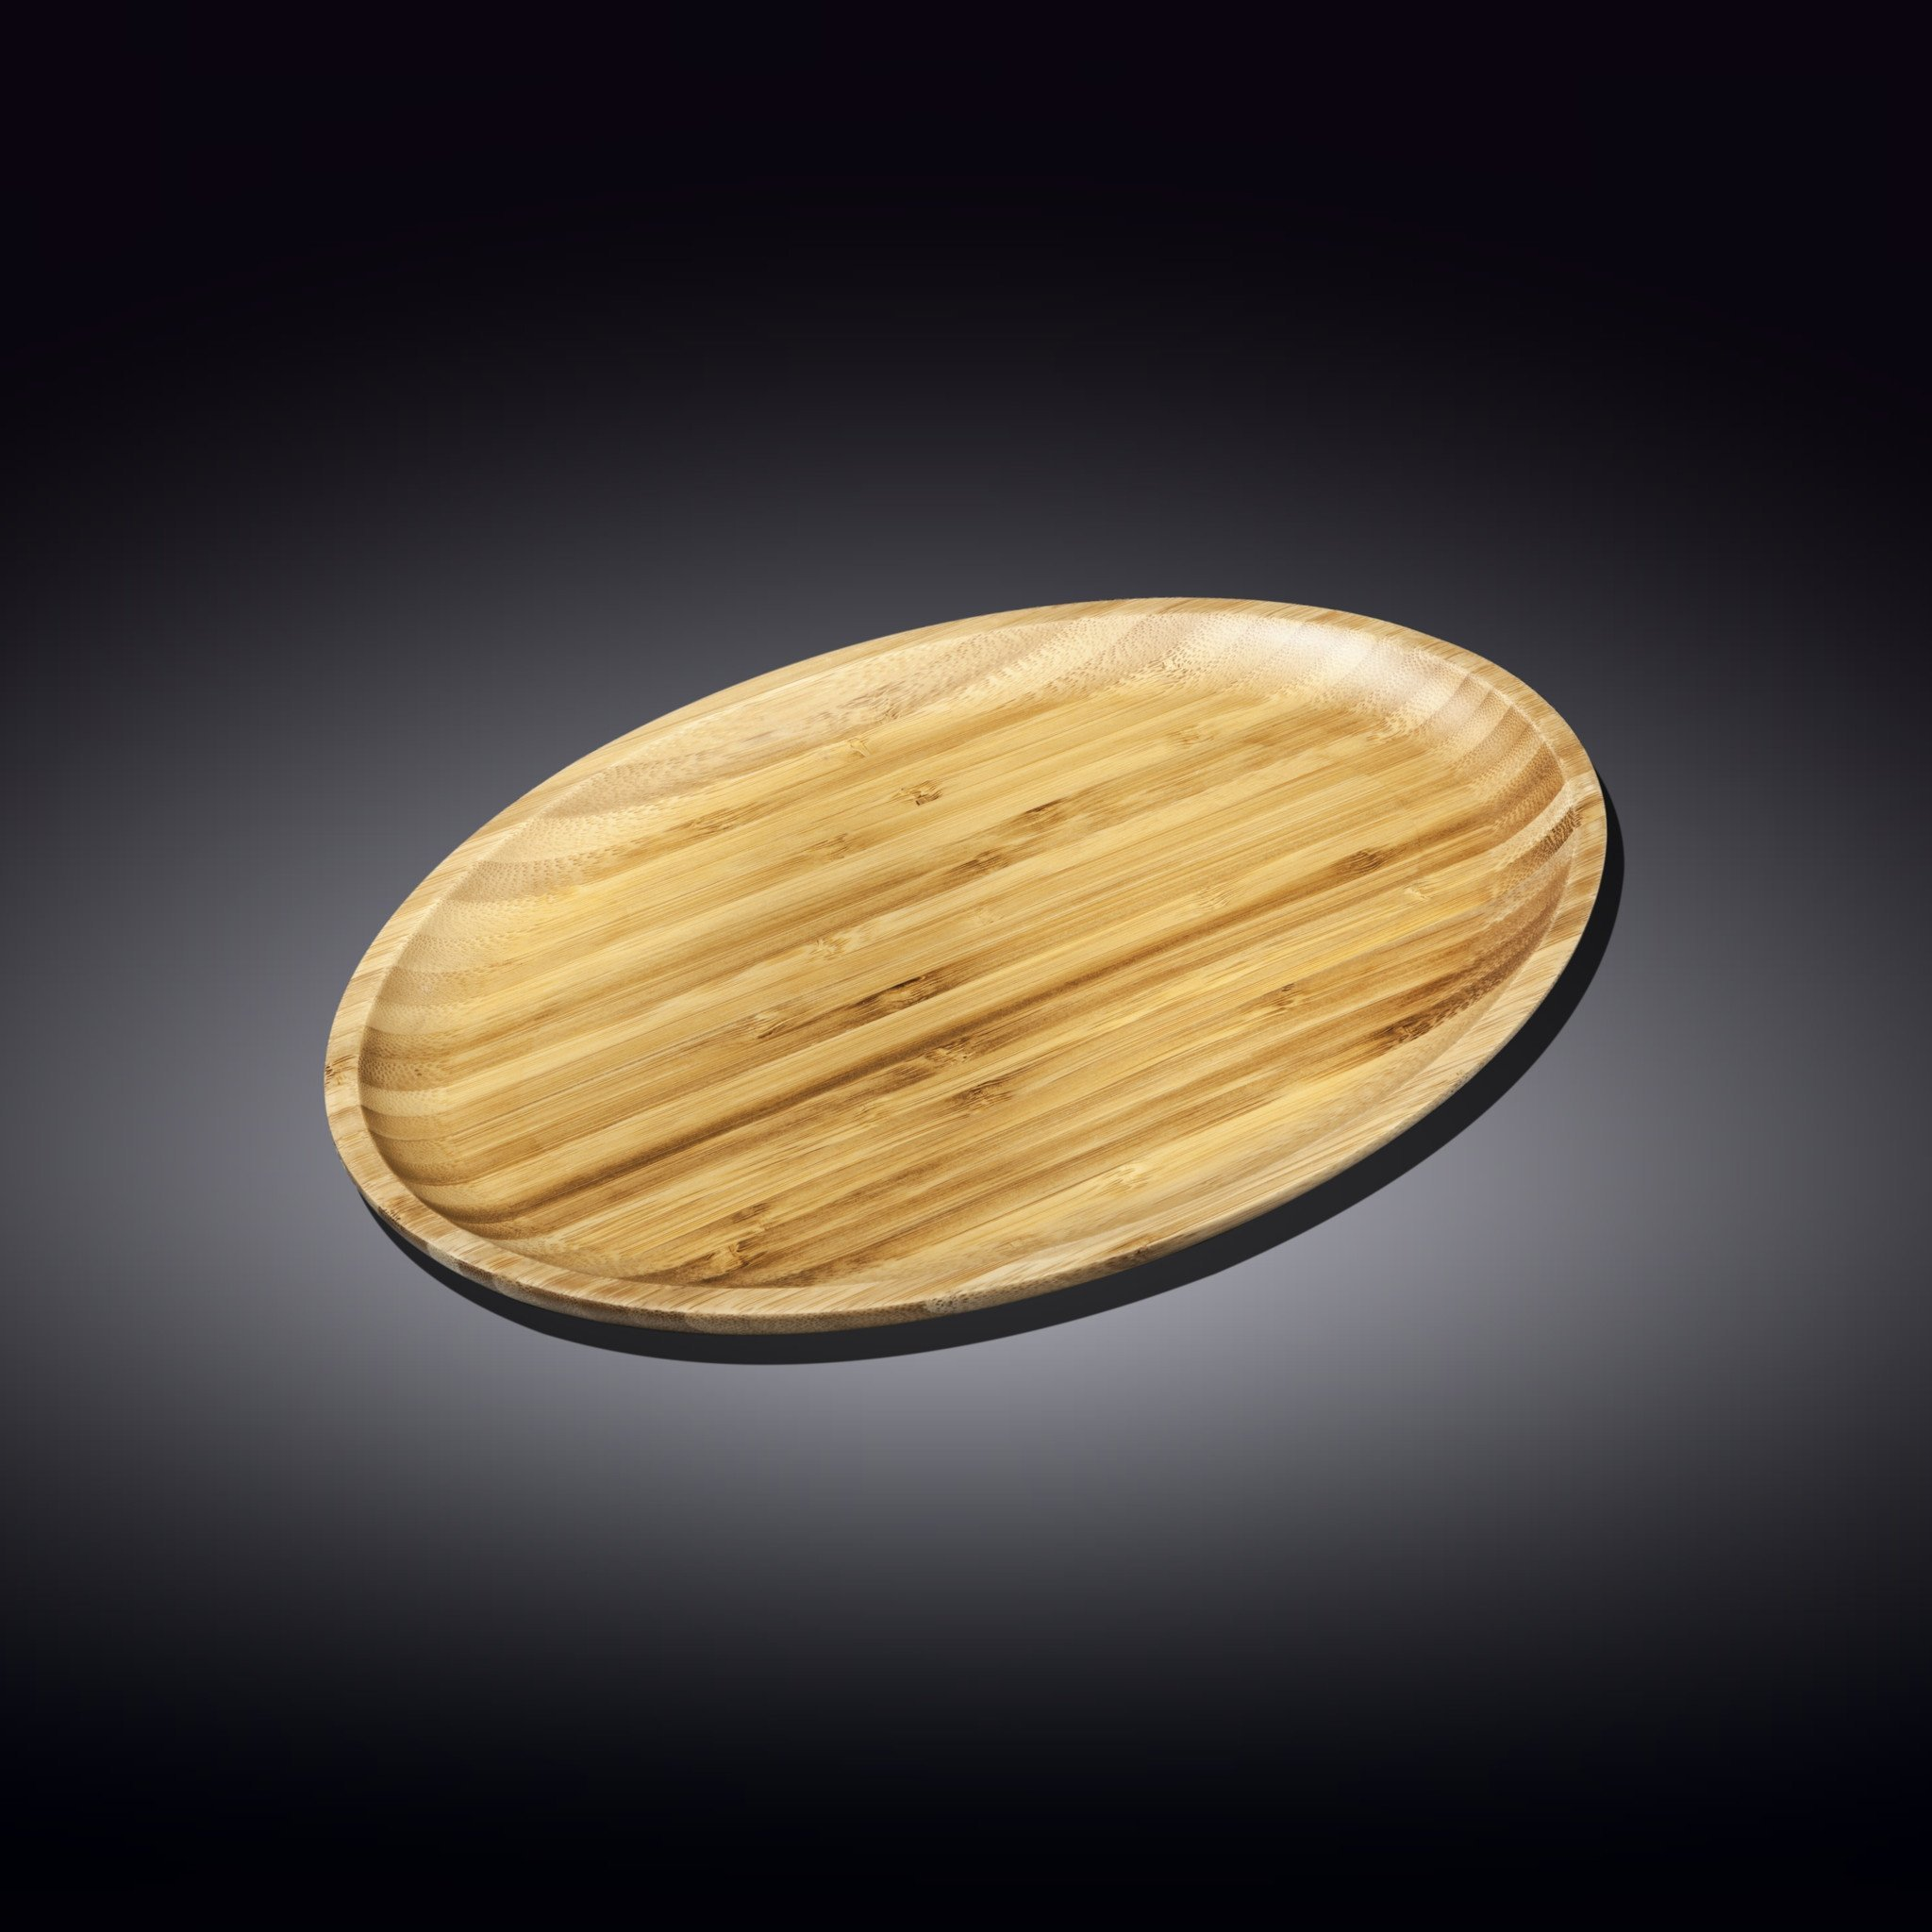 Блюдо 35.5*24.5см Бамбук Wilmax  овальное